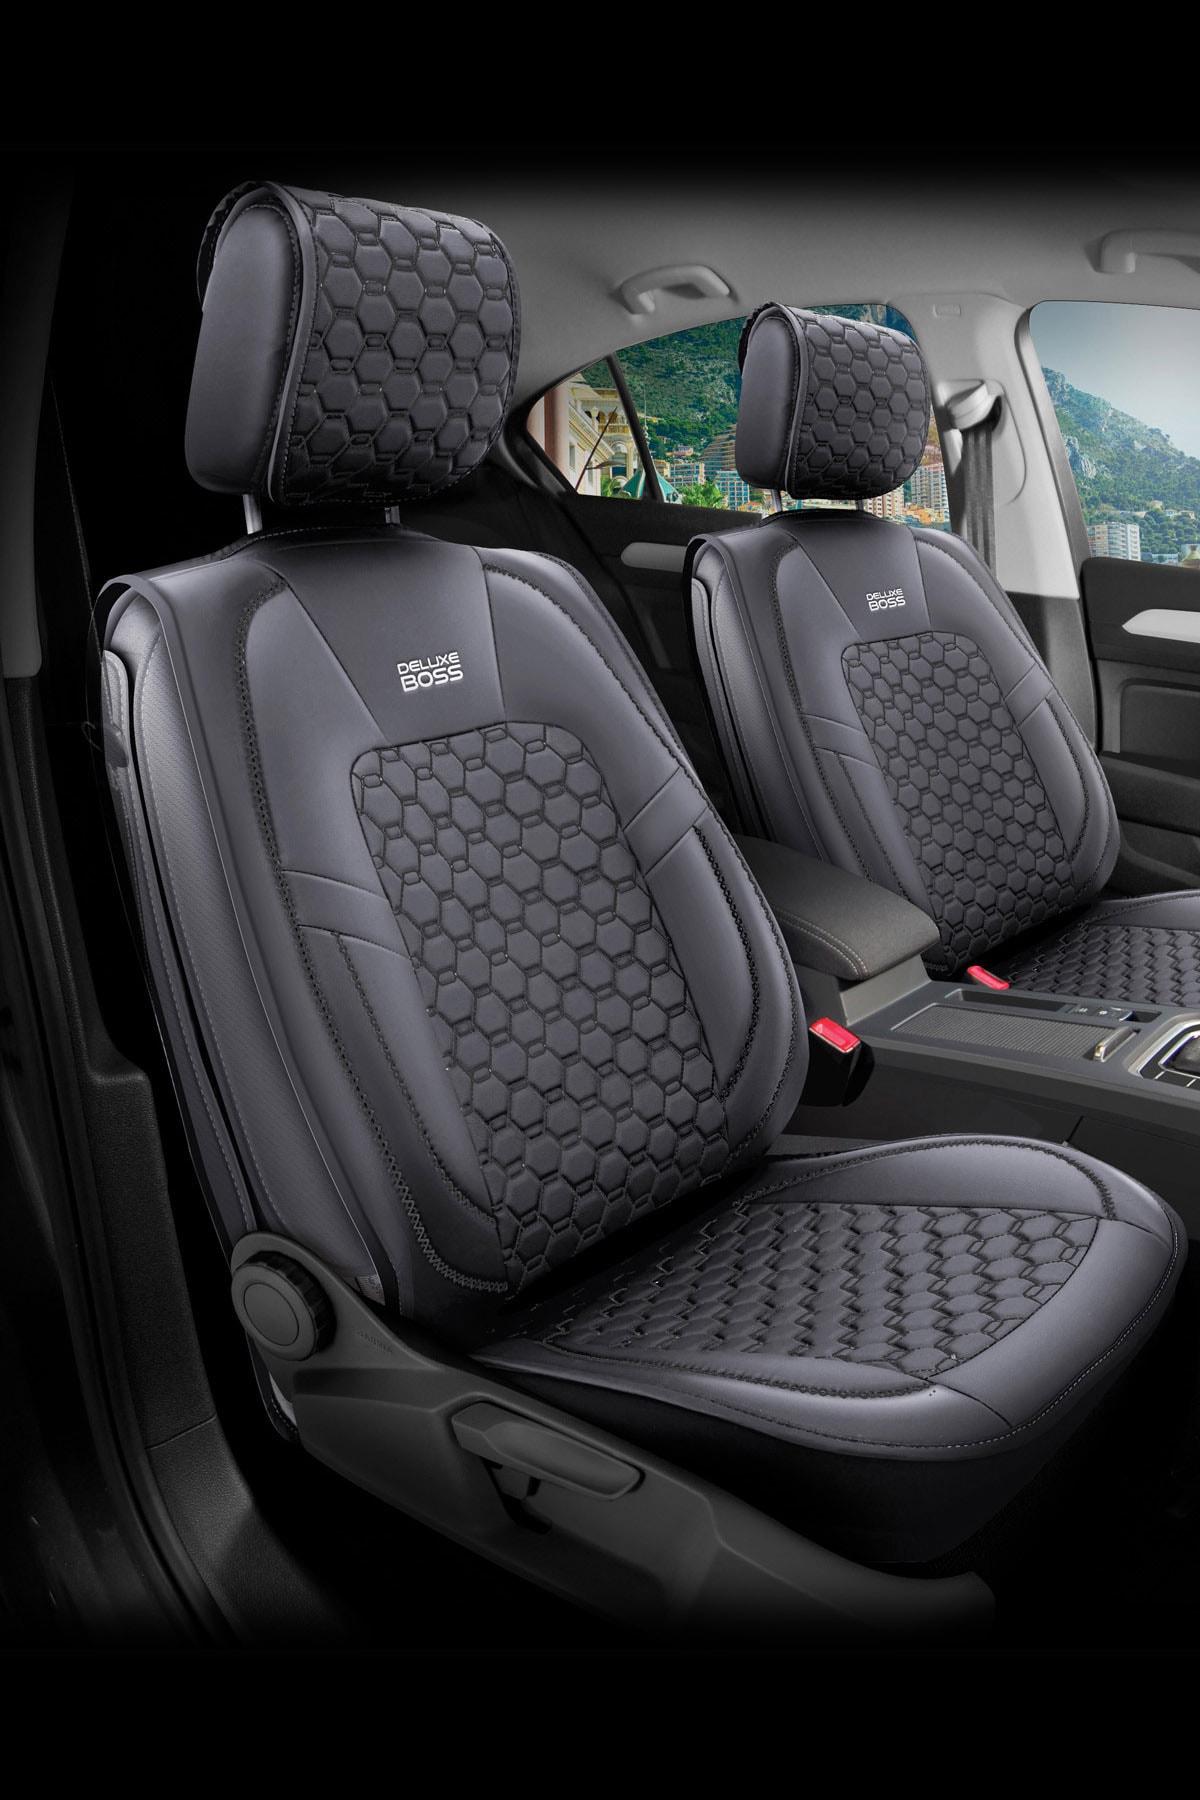 Deluxe Boss Toyota Corolla Uyumlu Deri Koltuk Kilifi Deluxe Boss Luxury Fit Diamond Dm15 Trendyol